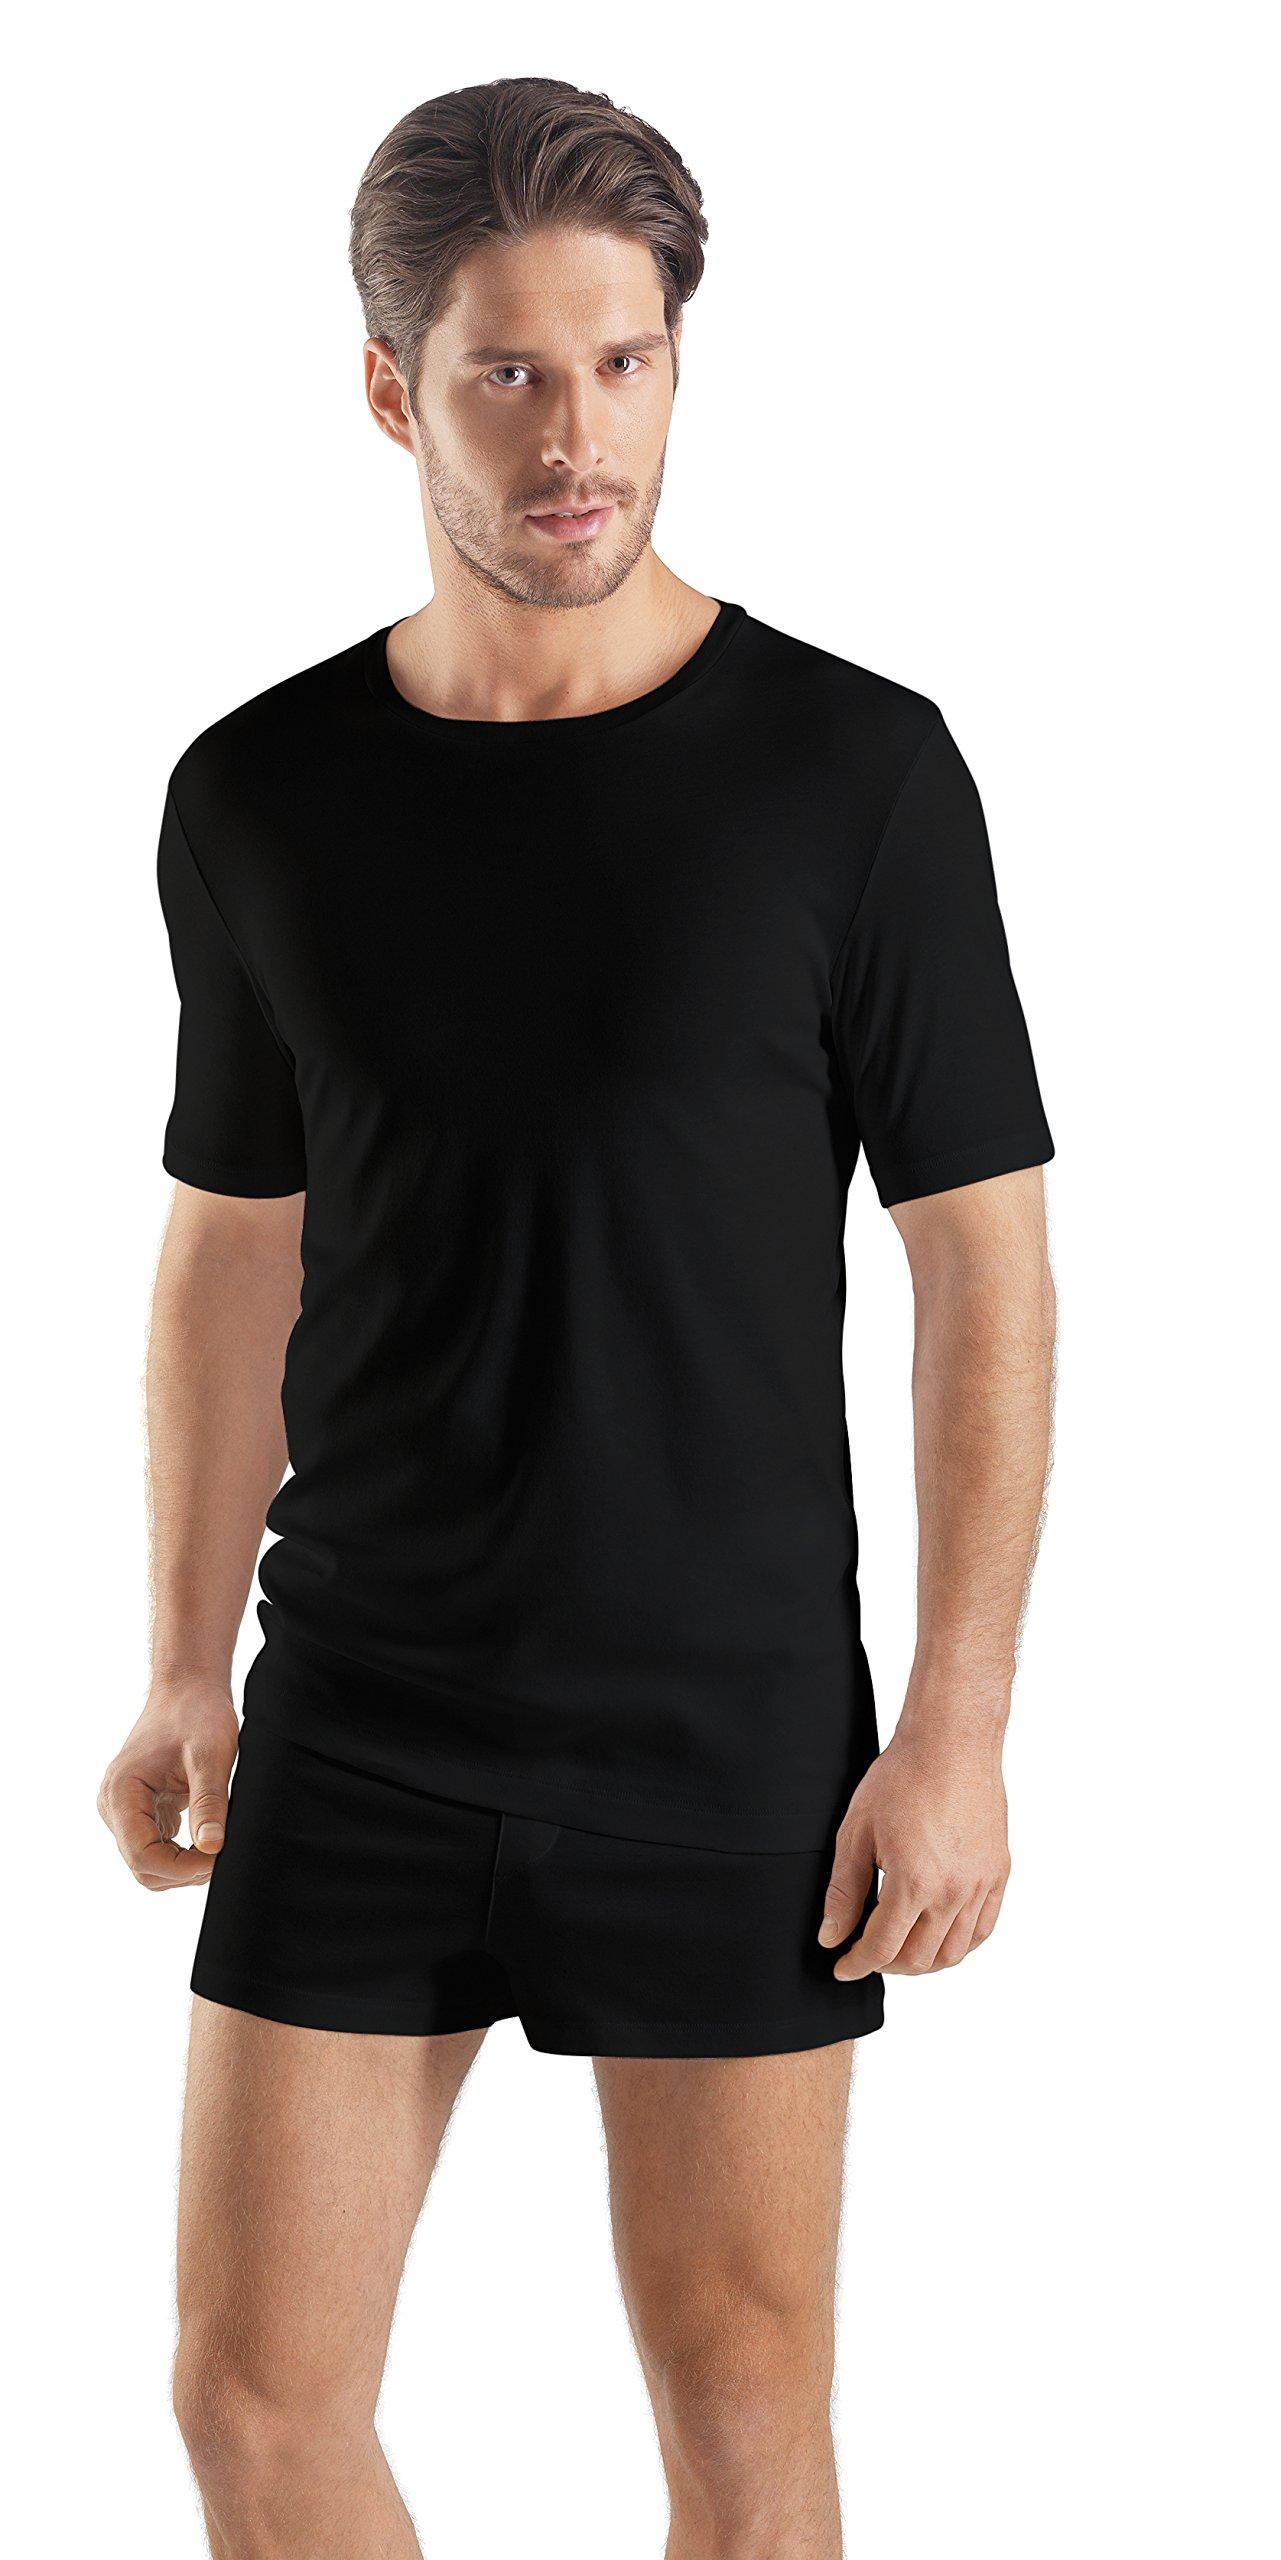 Hanro Men's Sea Island Cotton Short Sleeve Crew Neck 73174, Black, Large